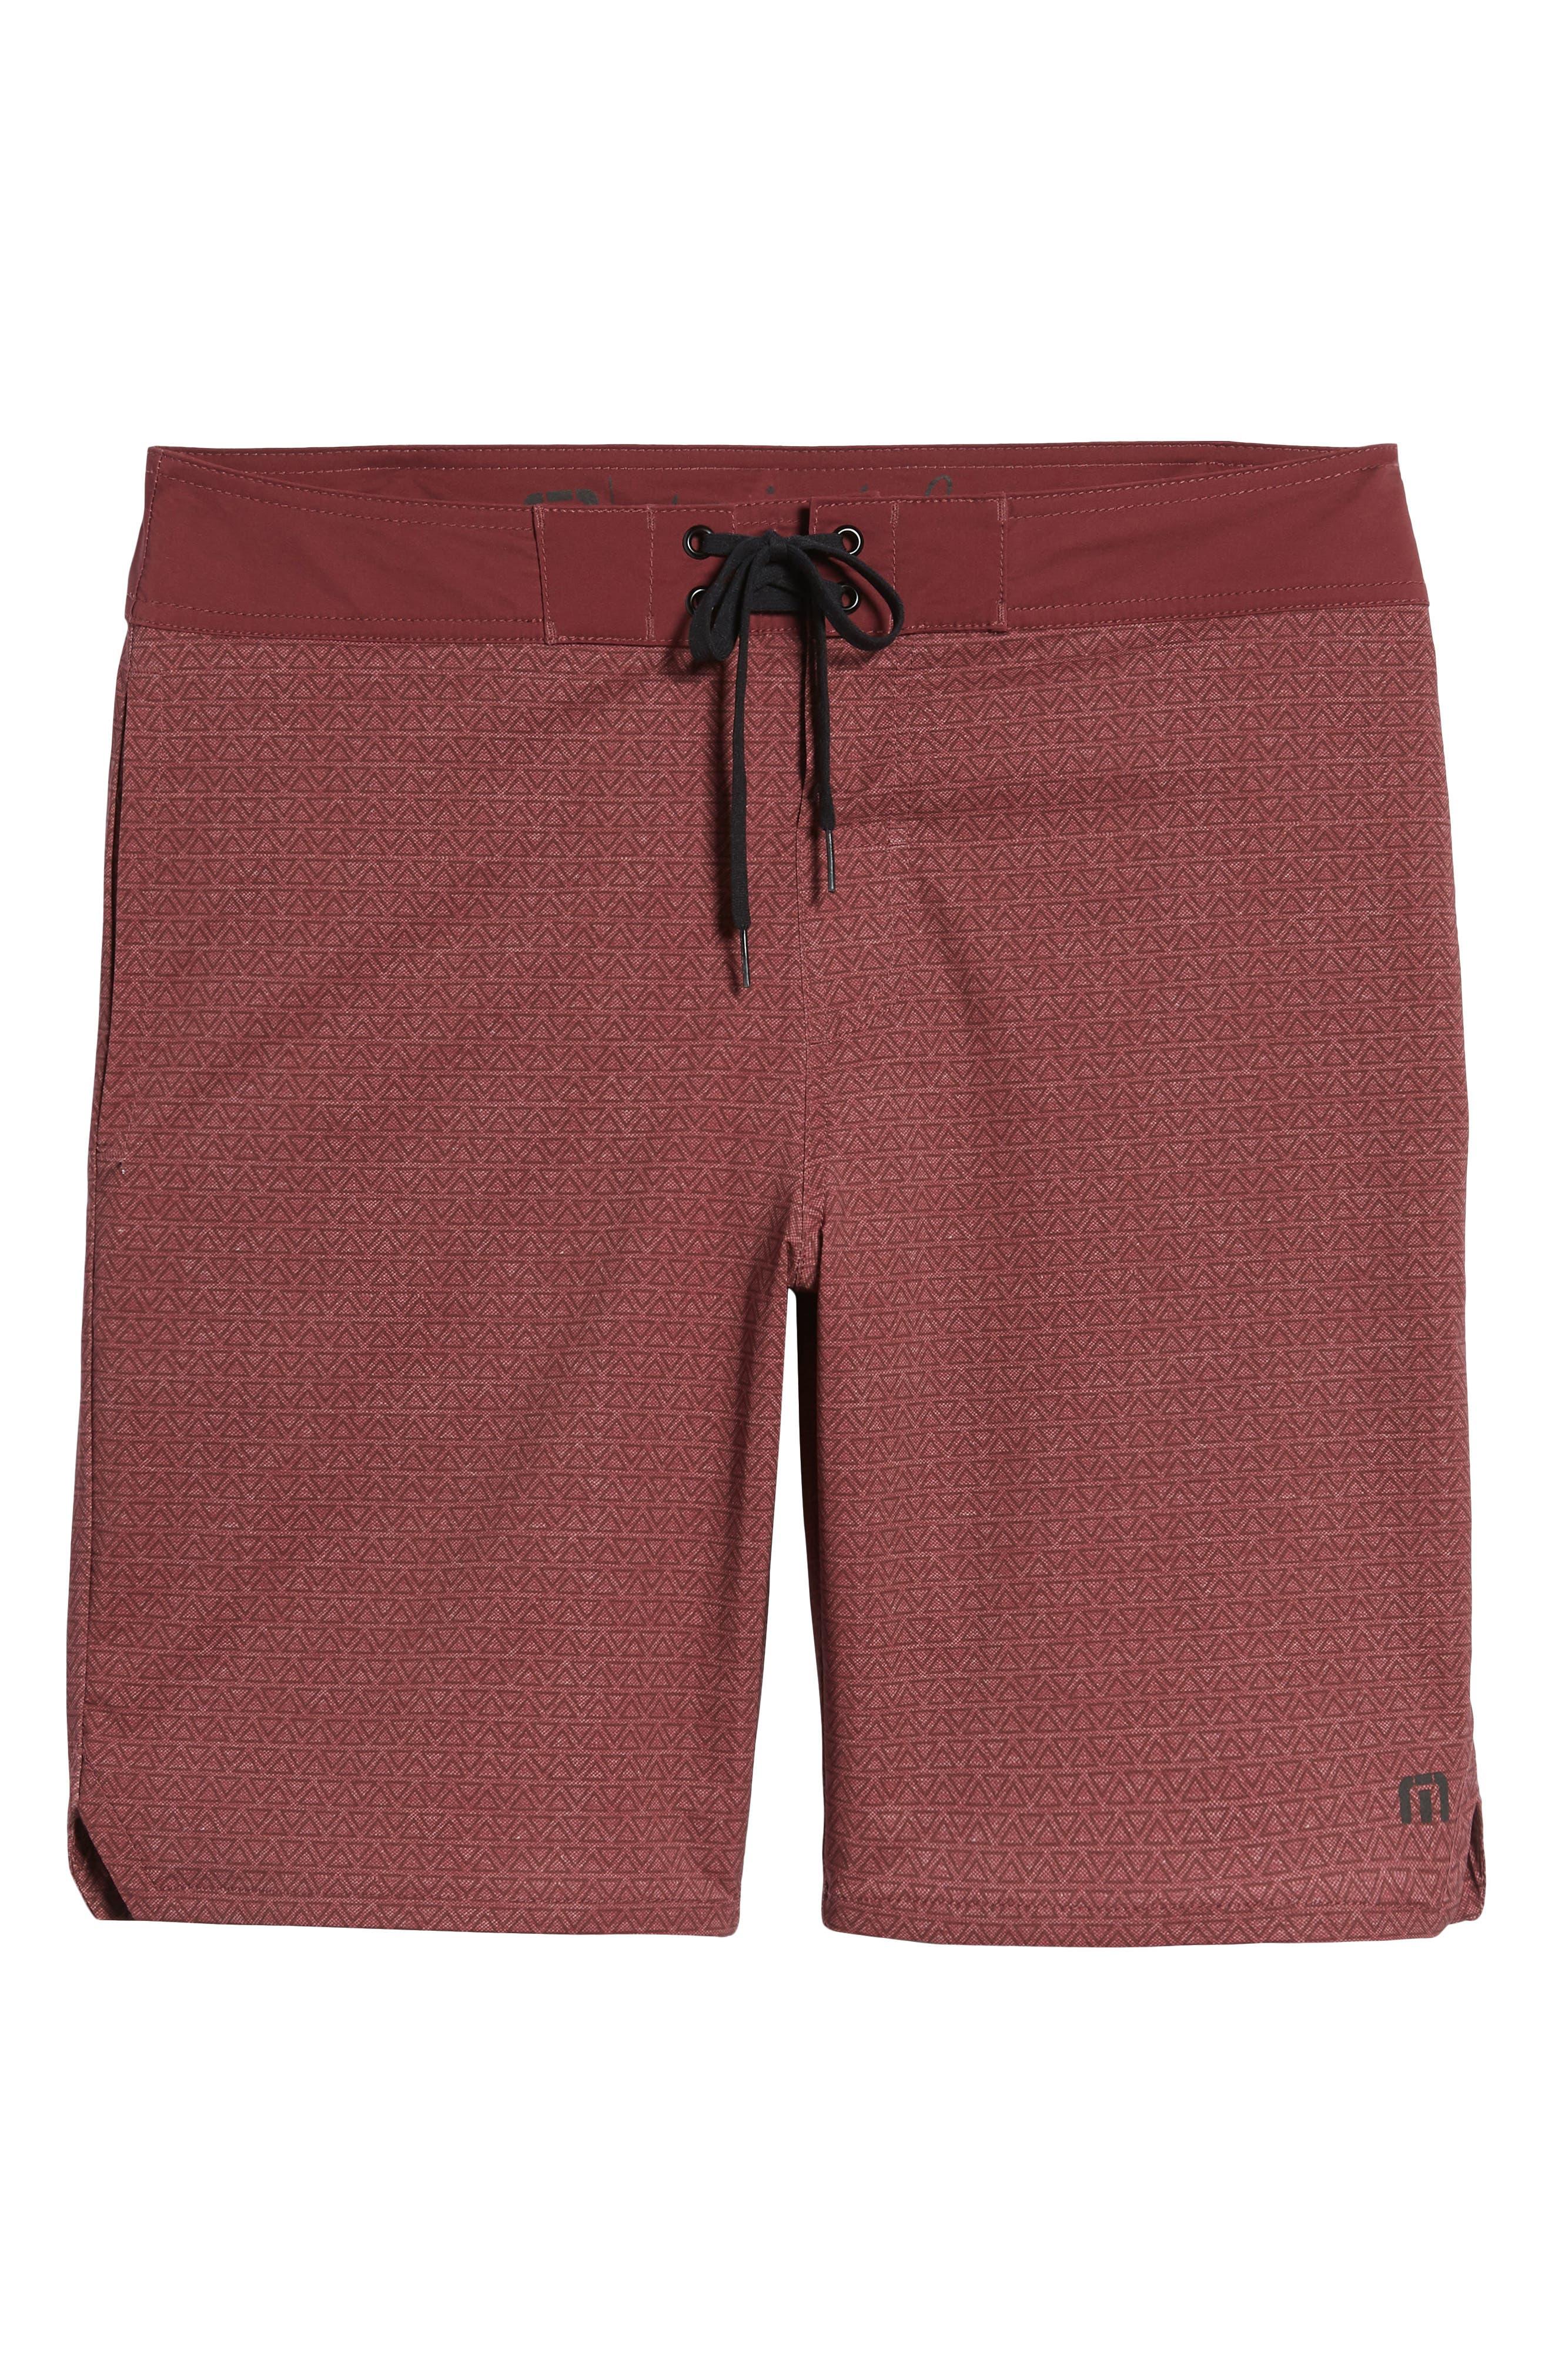 Blanders Regular Fit Board Shorts,                             Alternate thumbnail 6, color,                             Oxblood